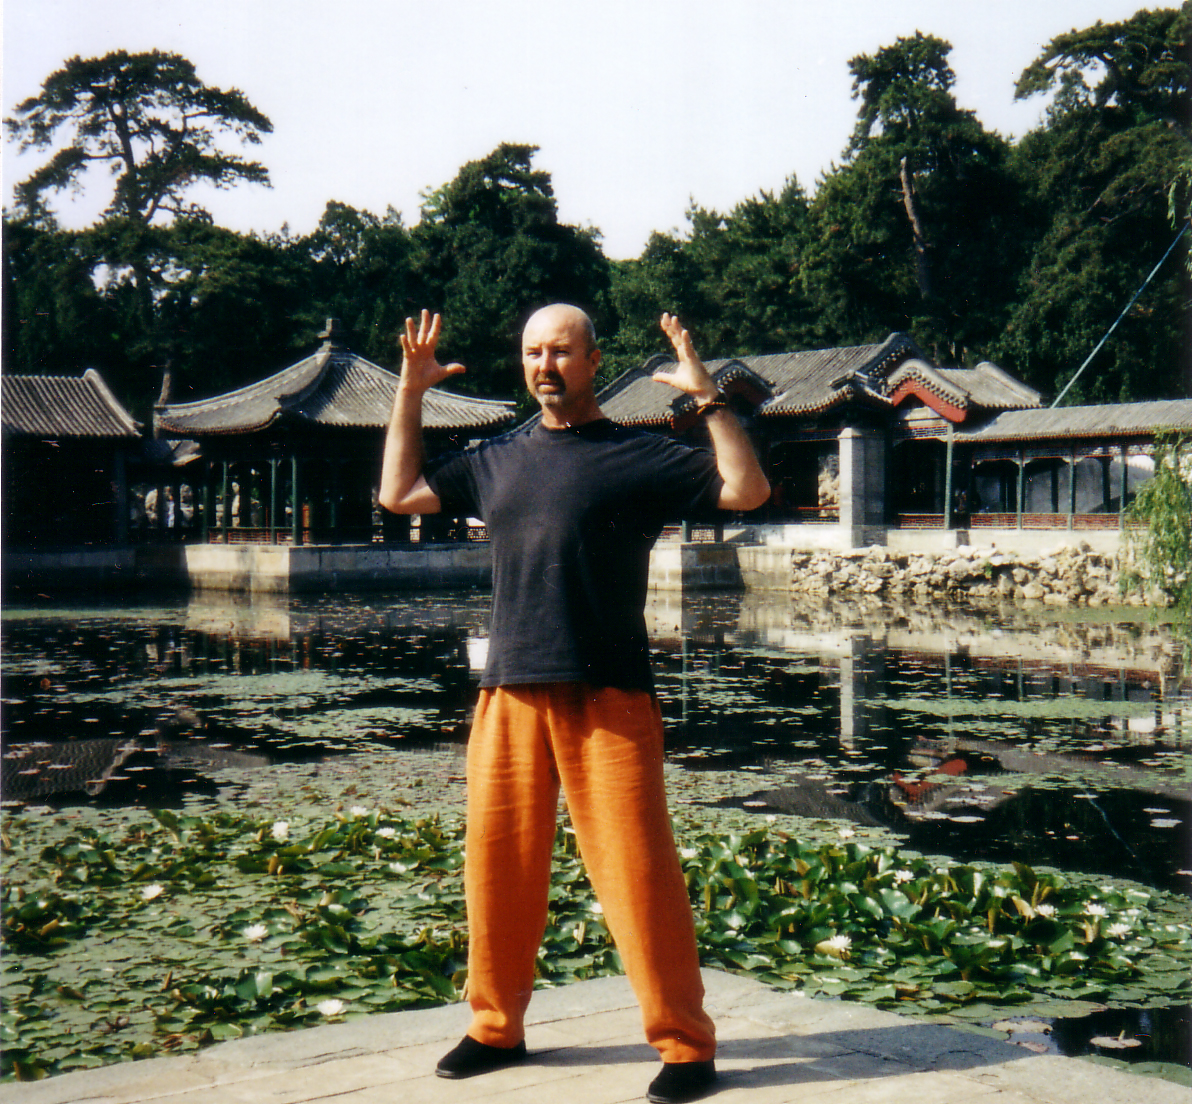 Simon-Blow-Summer-Palace-Beijing-2004-simonblowqigong.com